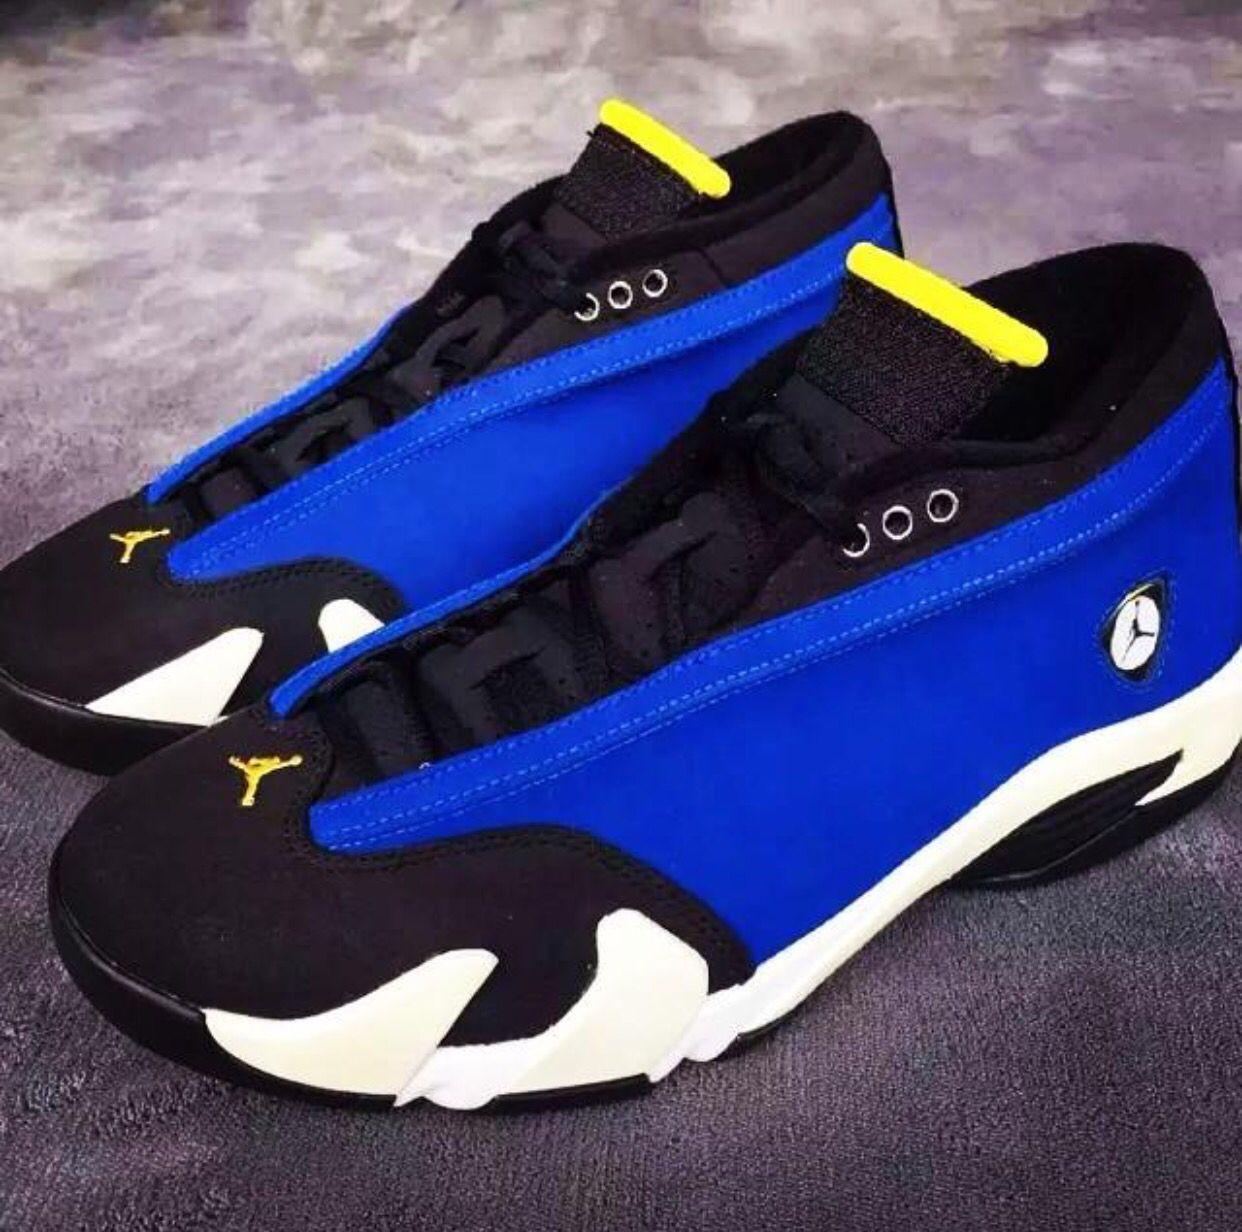 the best attitude d2ec4 04a42 inexpensive jordan 14 blue and yellow e90f1 93a3b